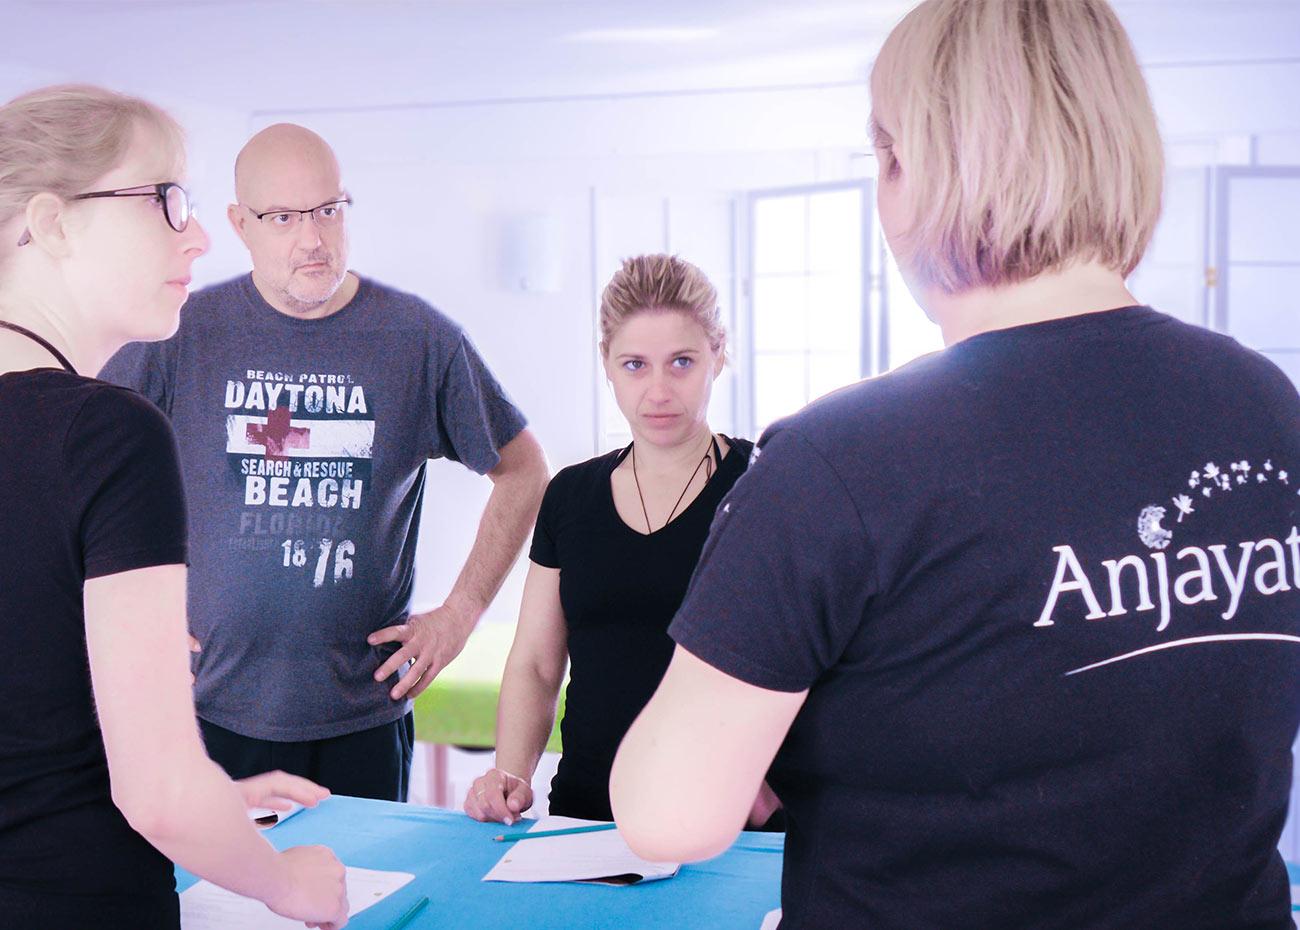 anatomie-adaptee-au-massage-bien-etre-anjayati-val-d-oise